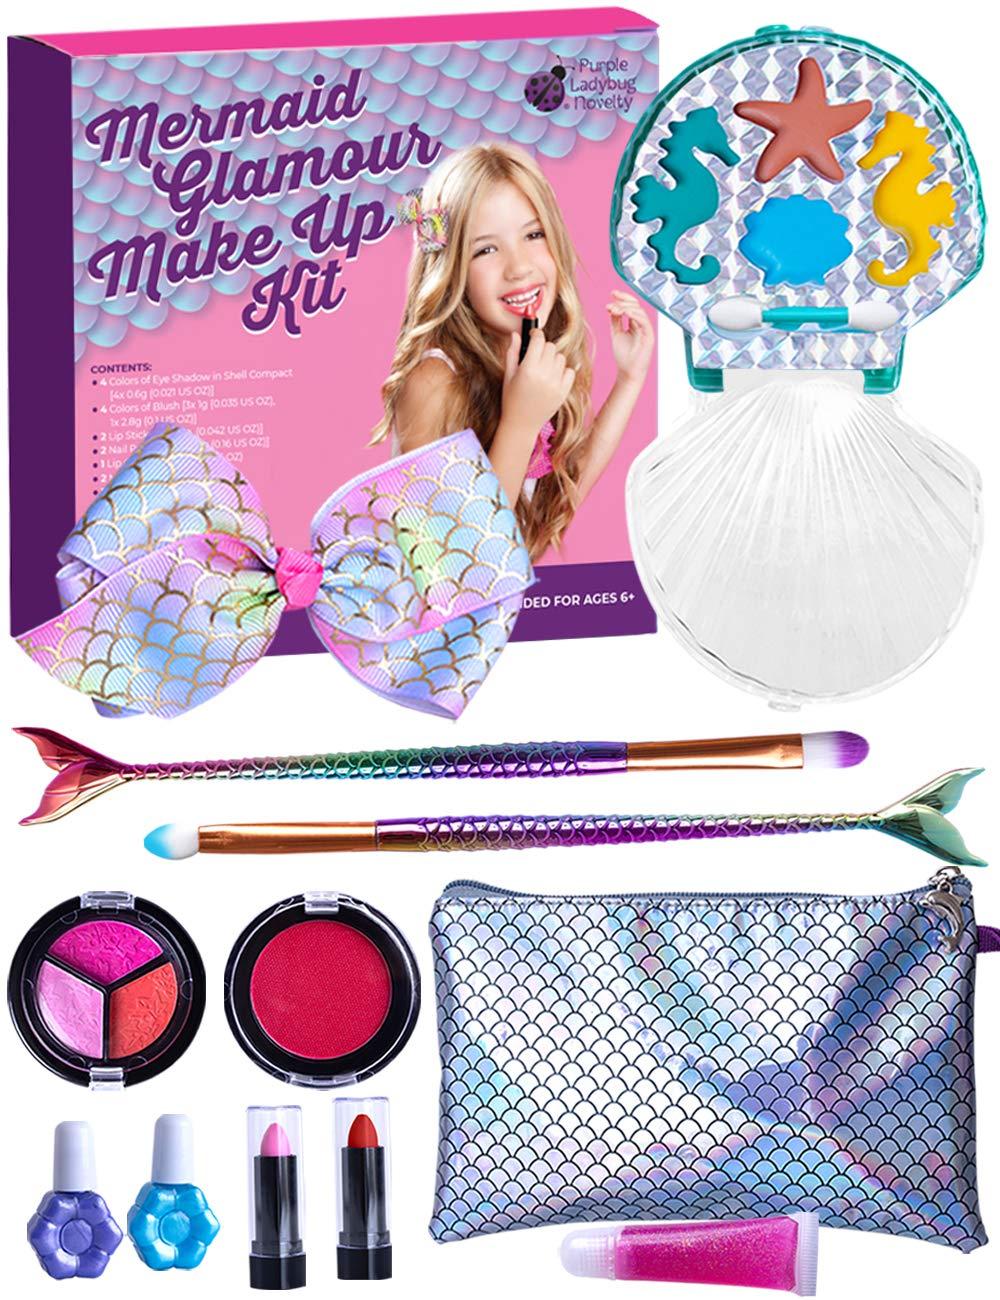 Purple Ladybug Mermaid Makeup Kit for Little Girls - Safe & Washable Makeup for Kids & Tweens - Fun Mermaid Themed Girl Gift Idea - Includes a Handy Wristlet, Lipstick, Blush, Eye Shadow, & More